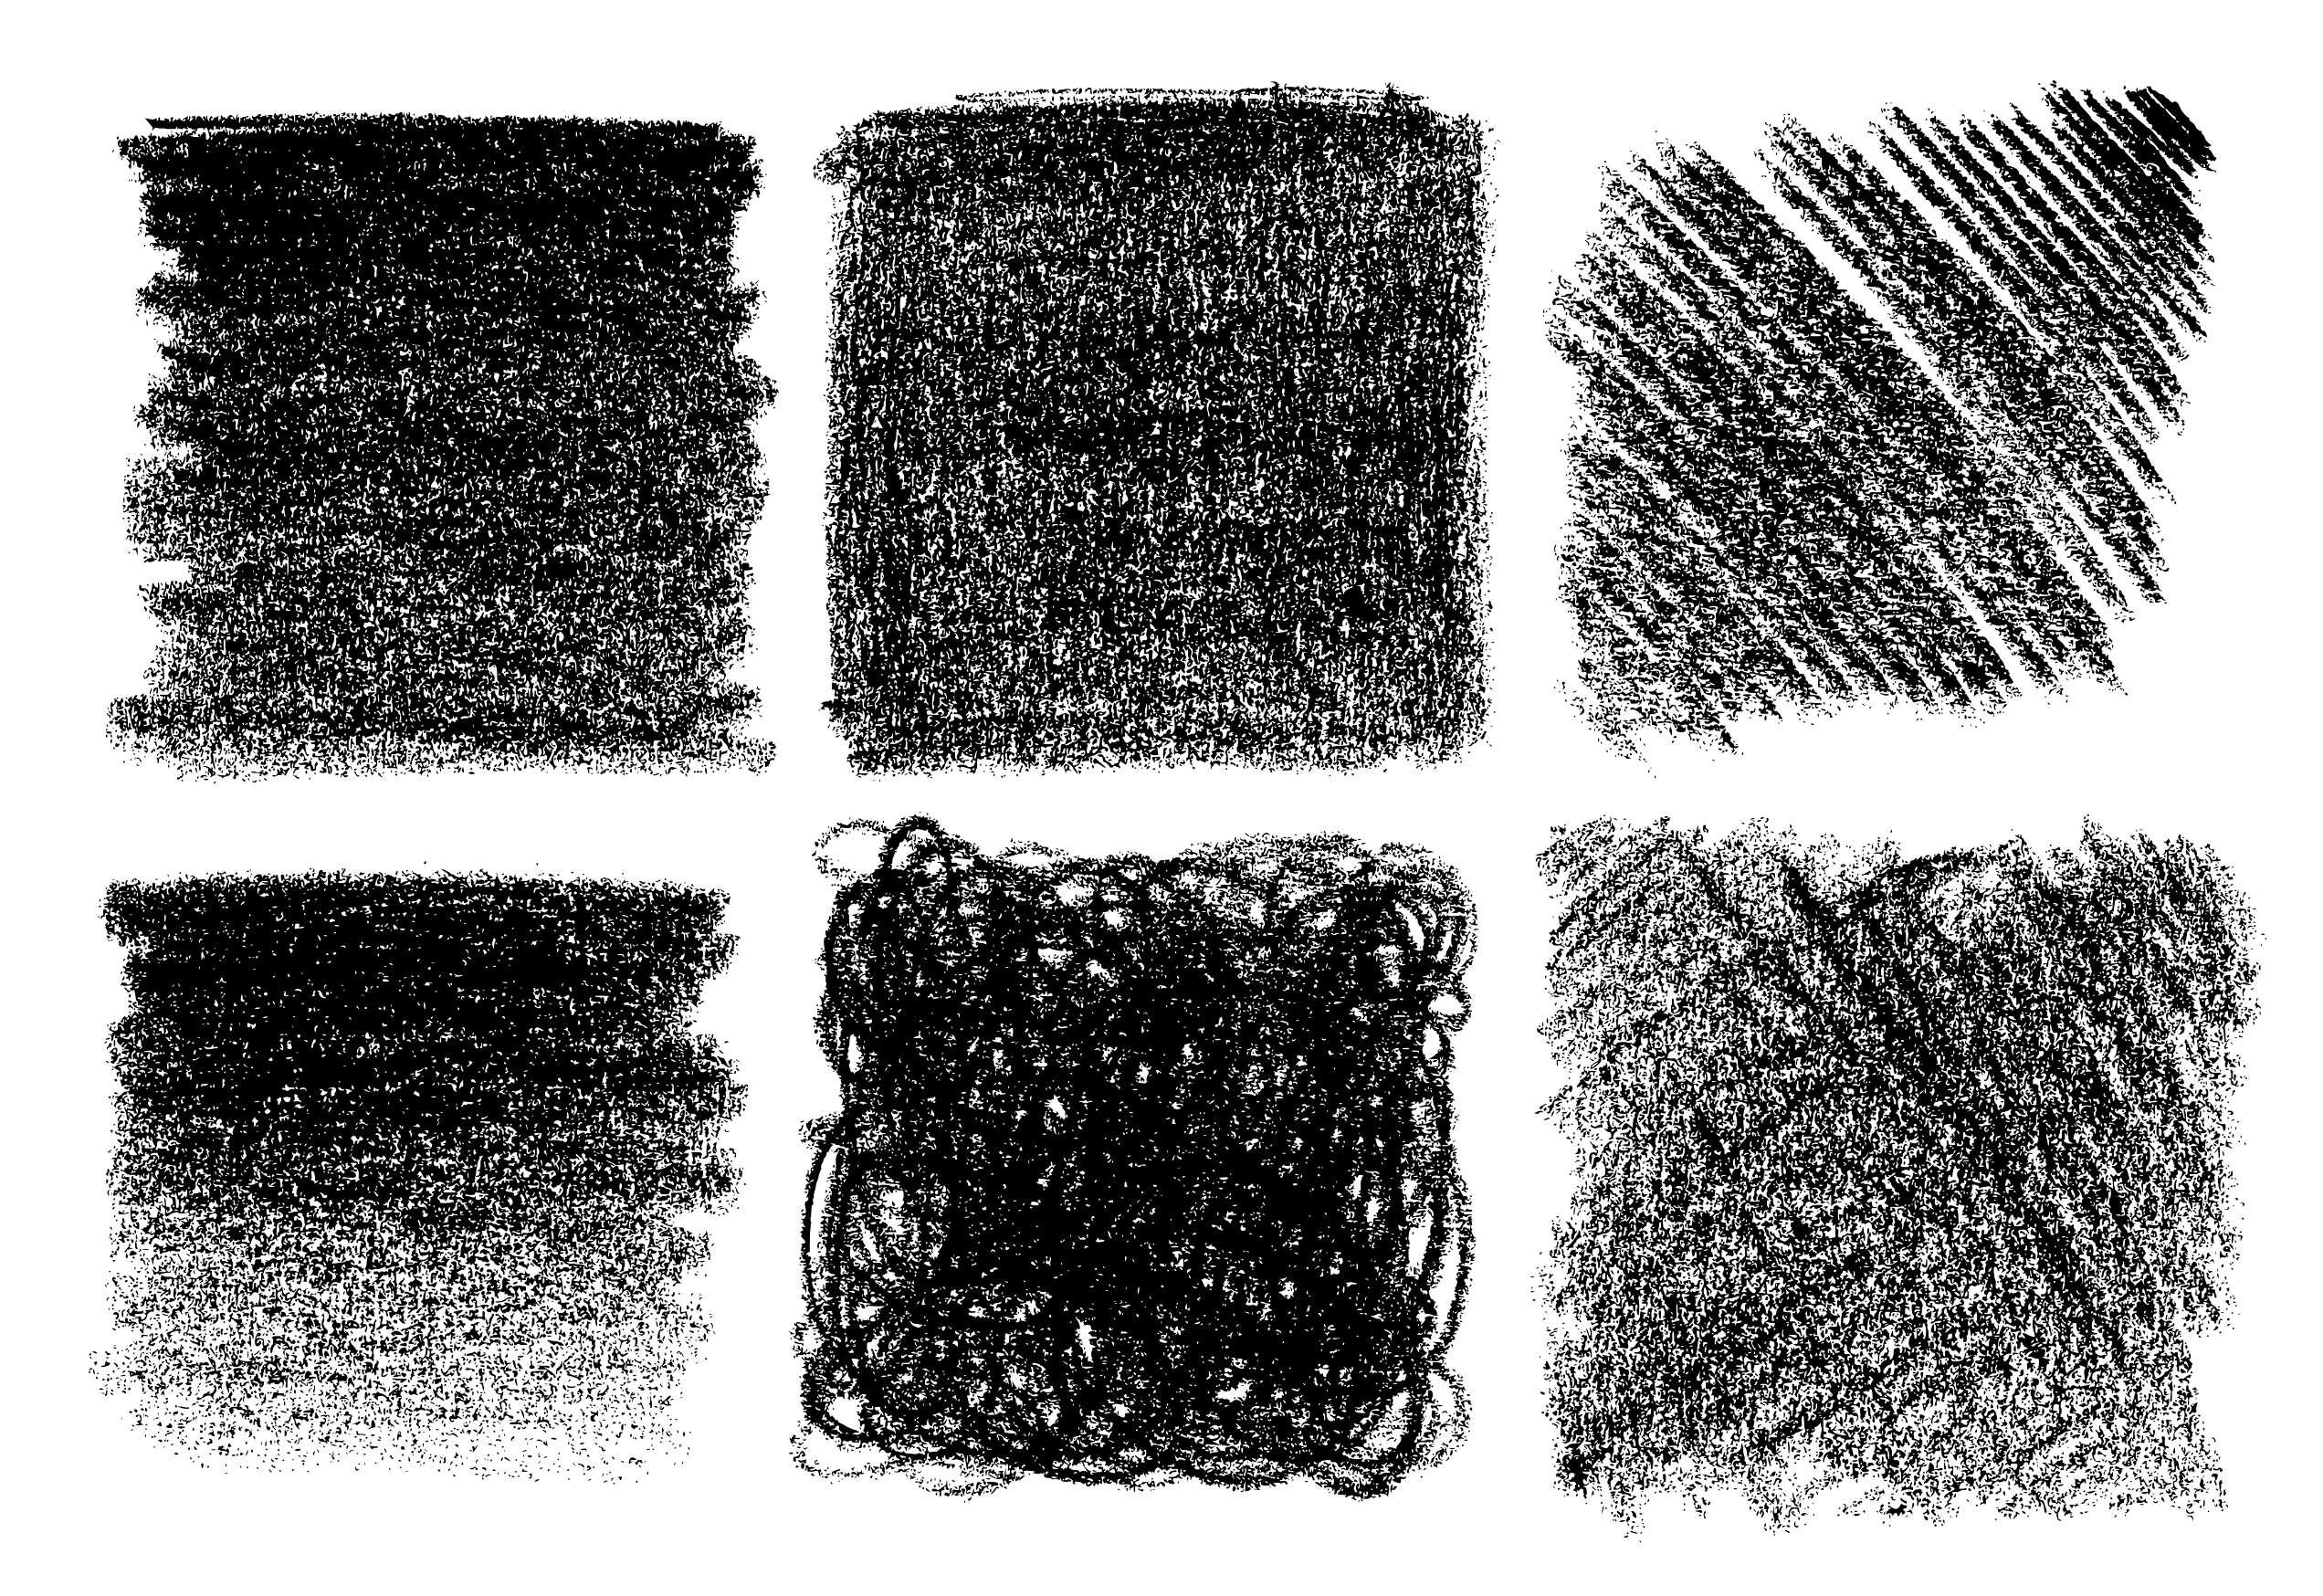 crayon-scribble-textures-cover.jpg